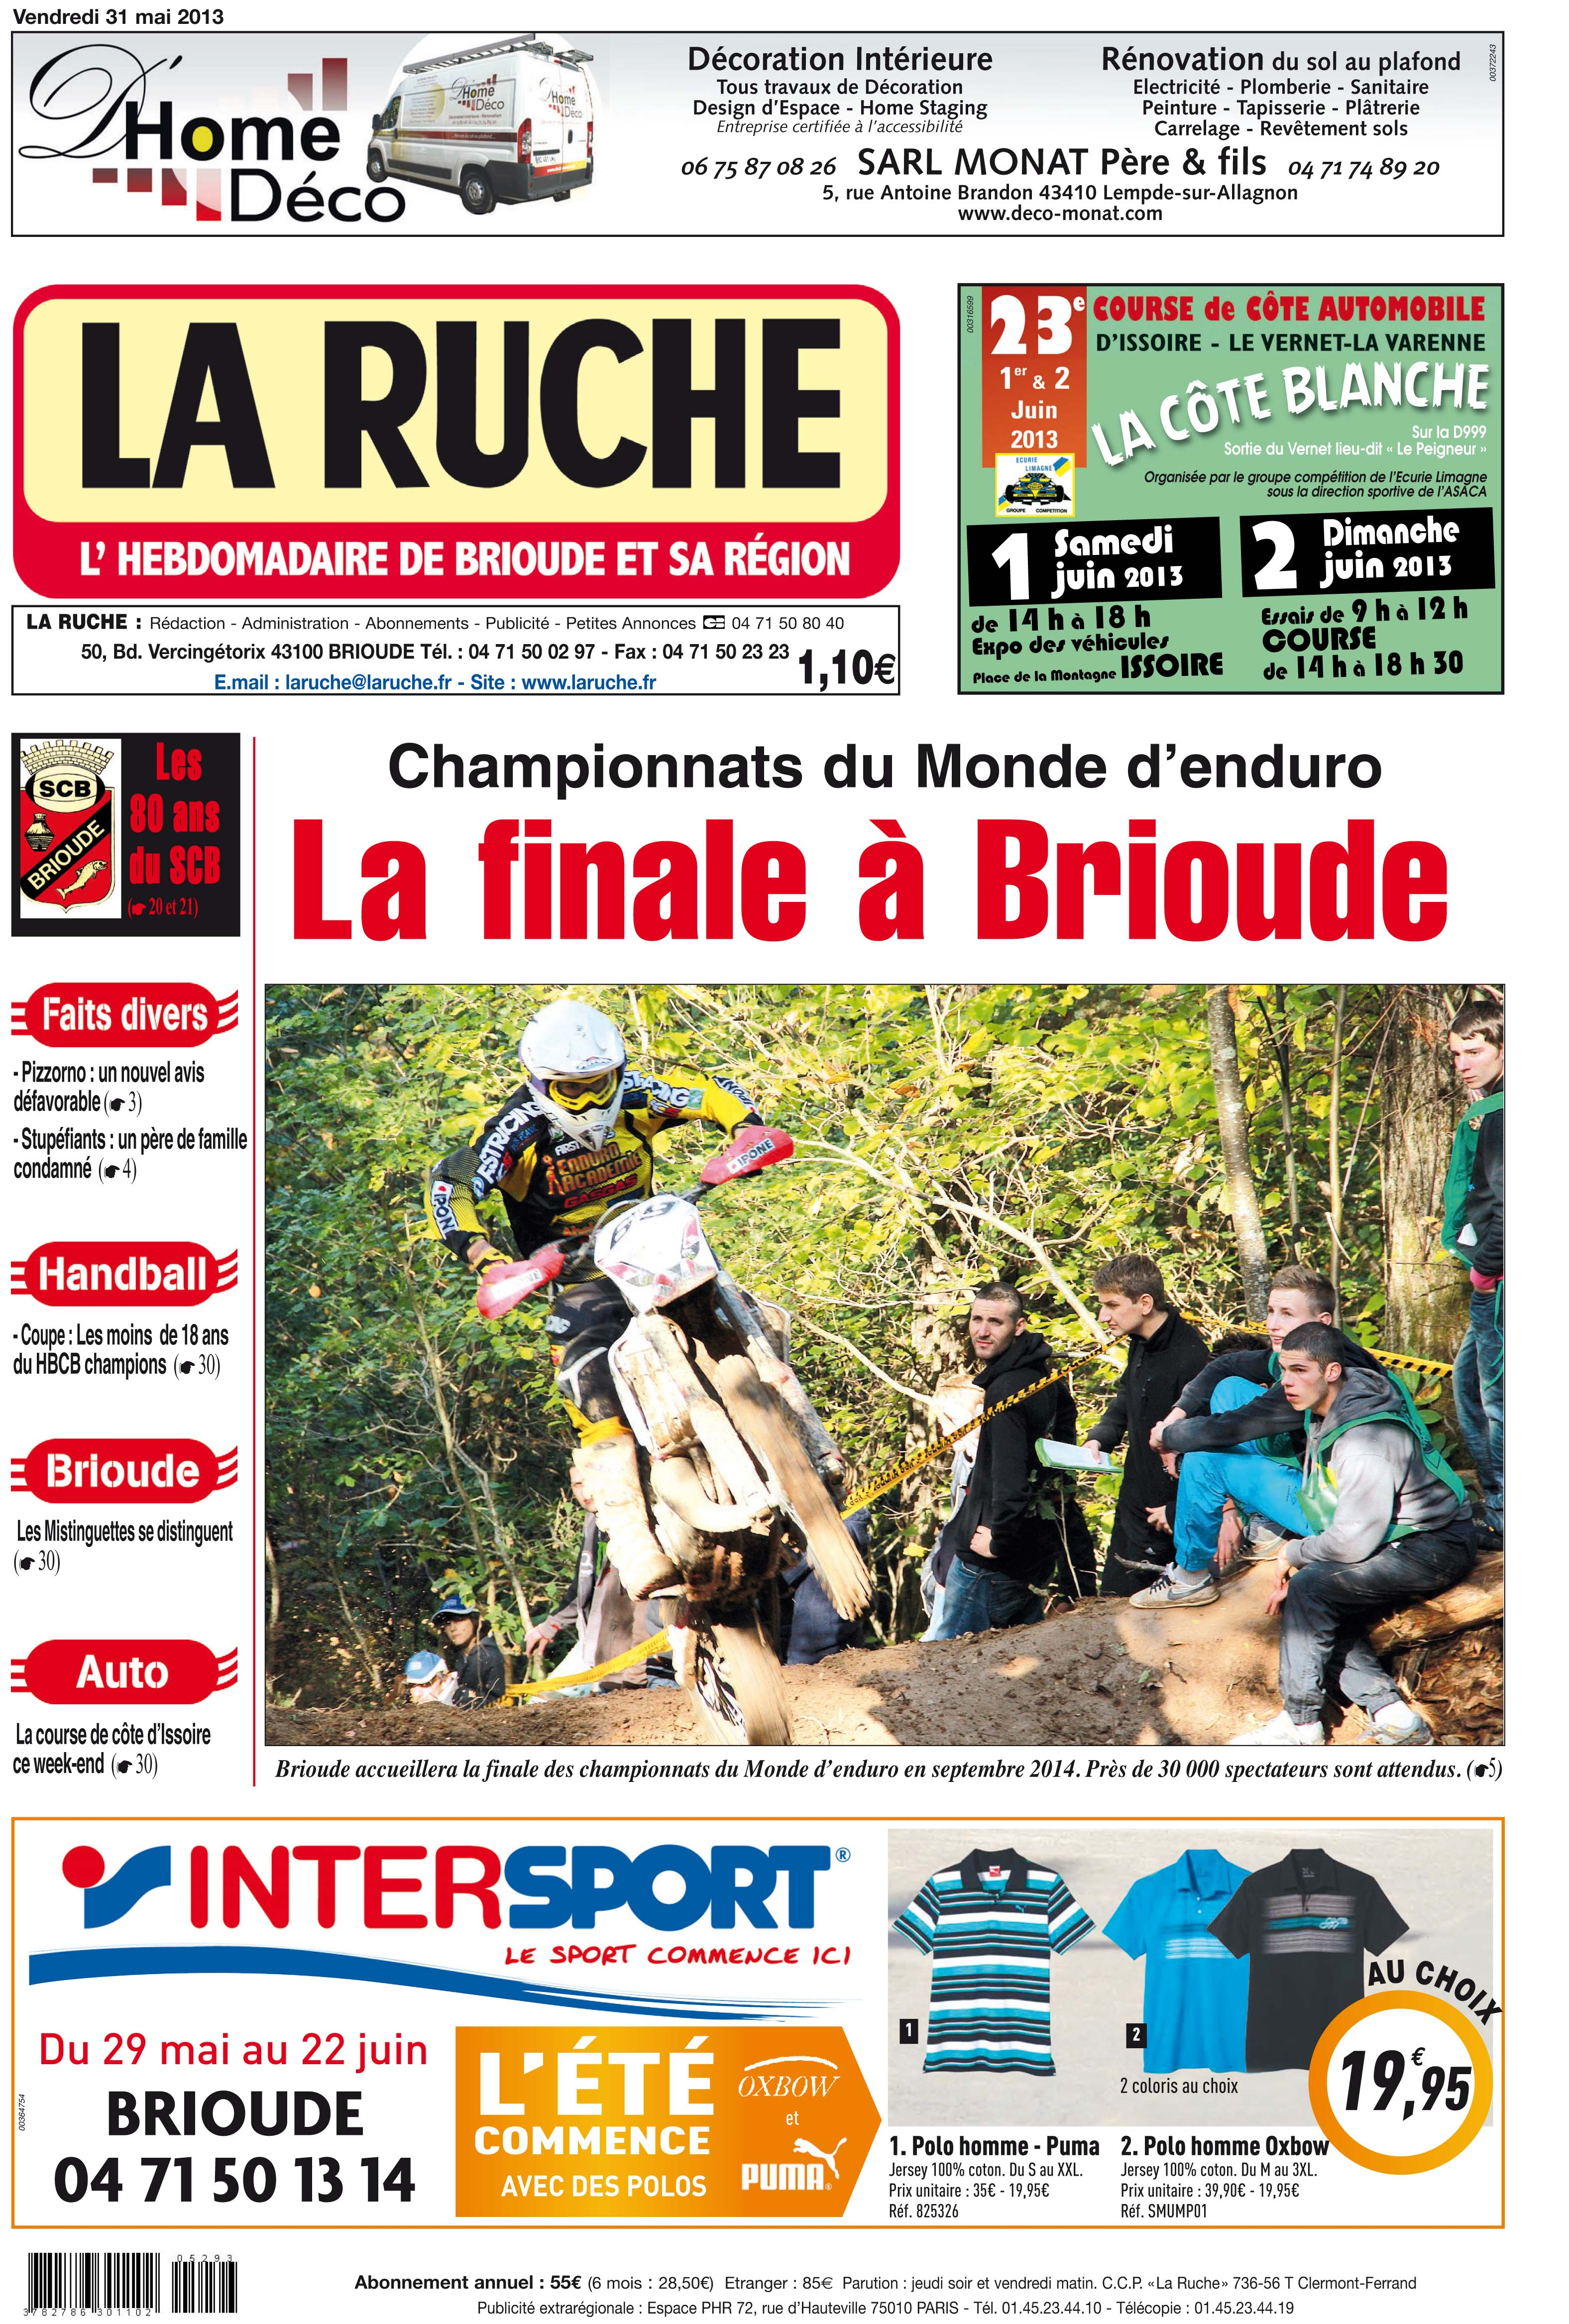 La Ruche 31/05/2013